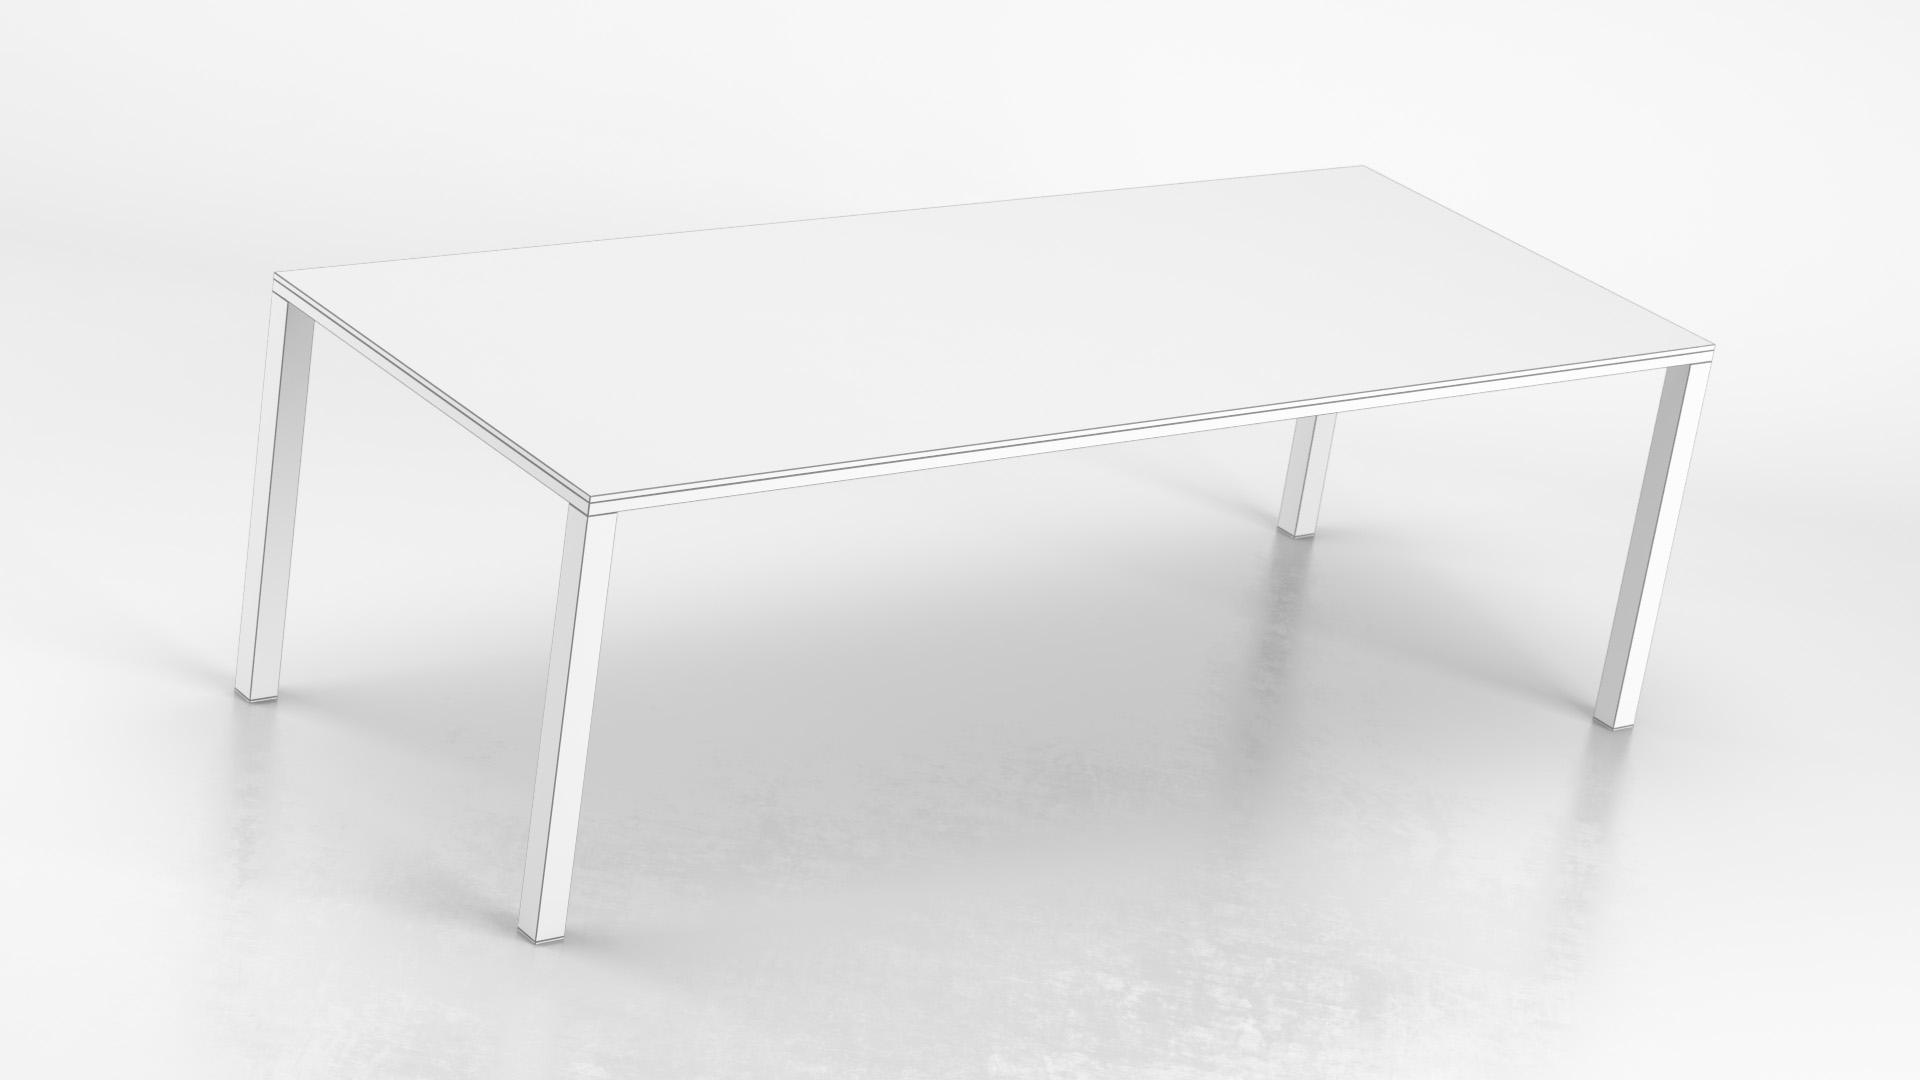 Tribu_Essentiel_Table_WhiteSet_01_wire_0003